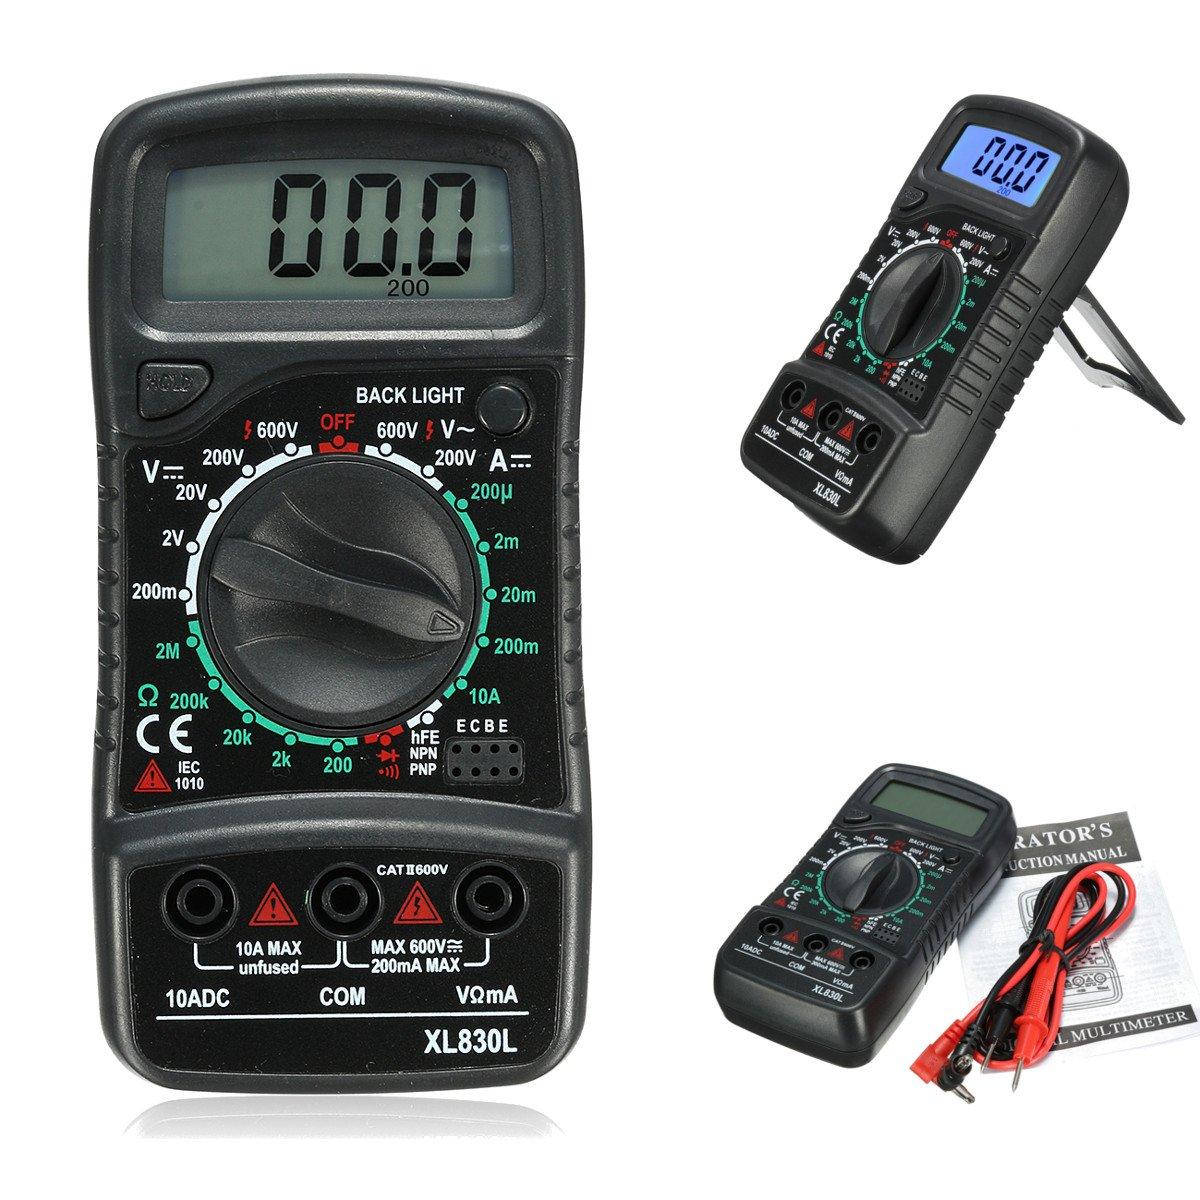 XL830L Digital LCD Multimeter Voltmeter Ammeter AC DC OHM